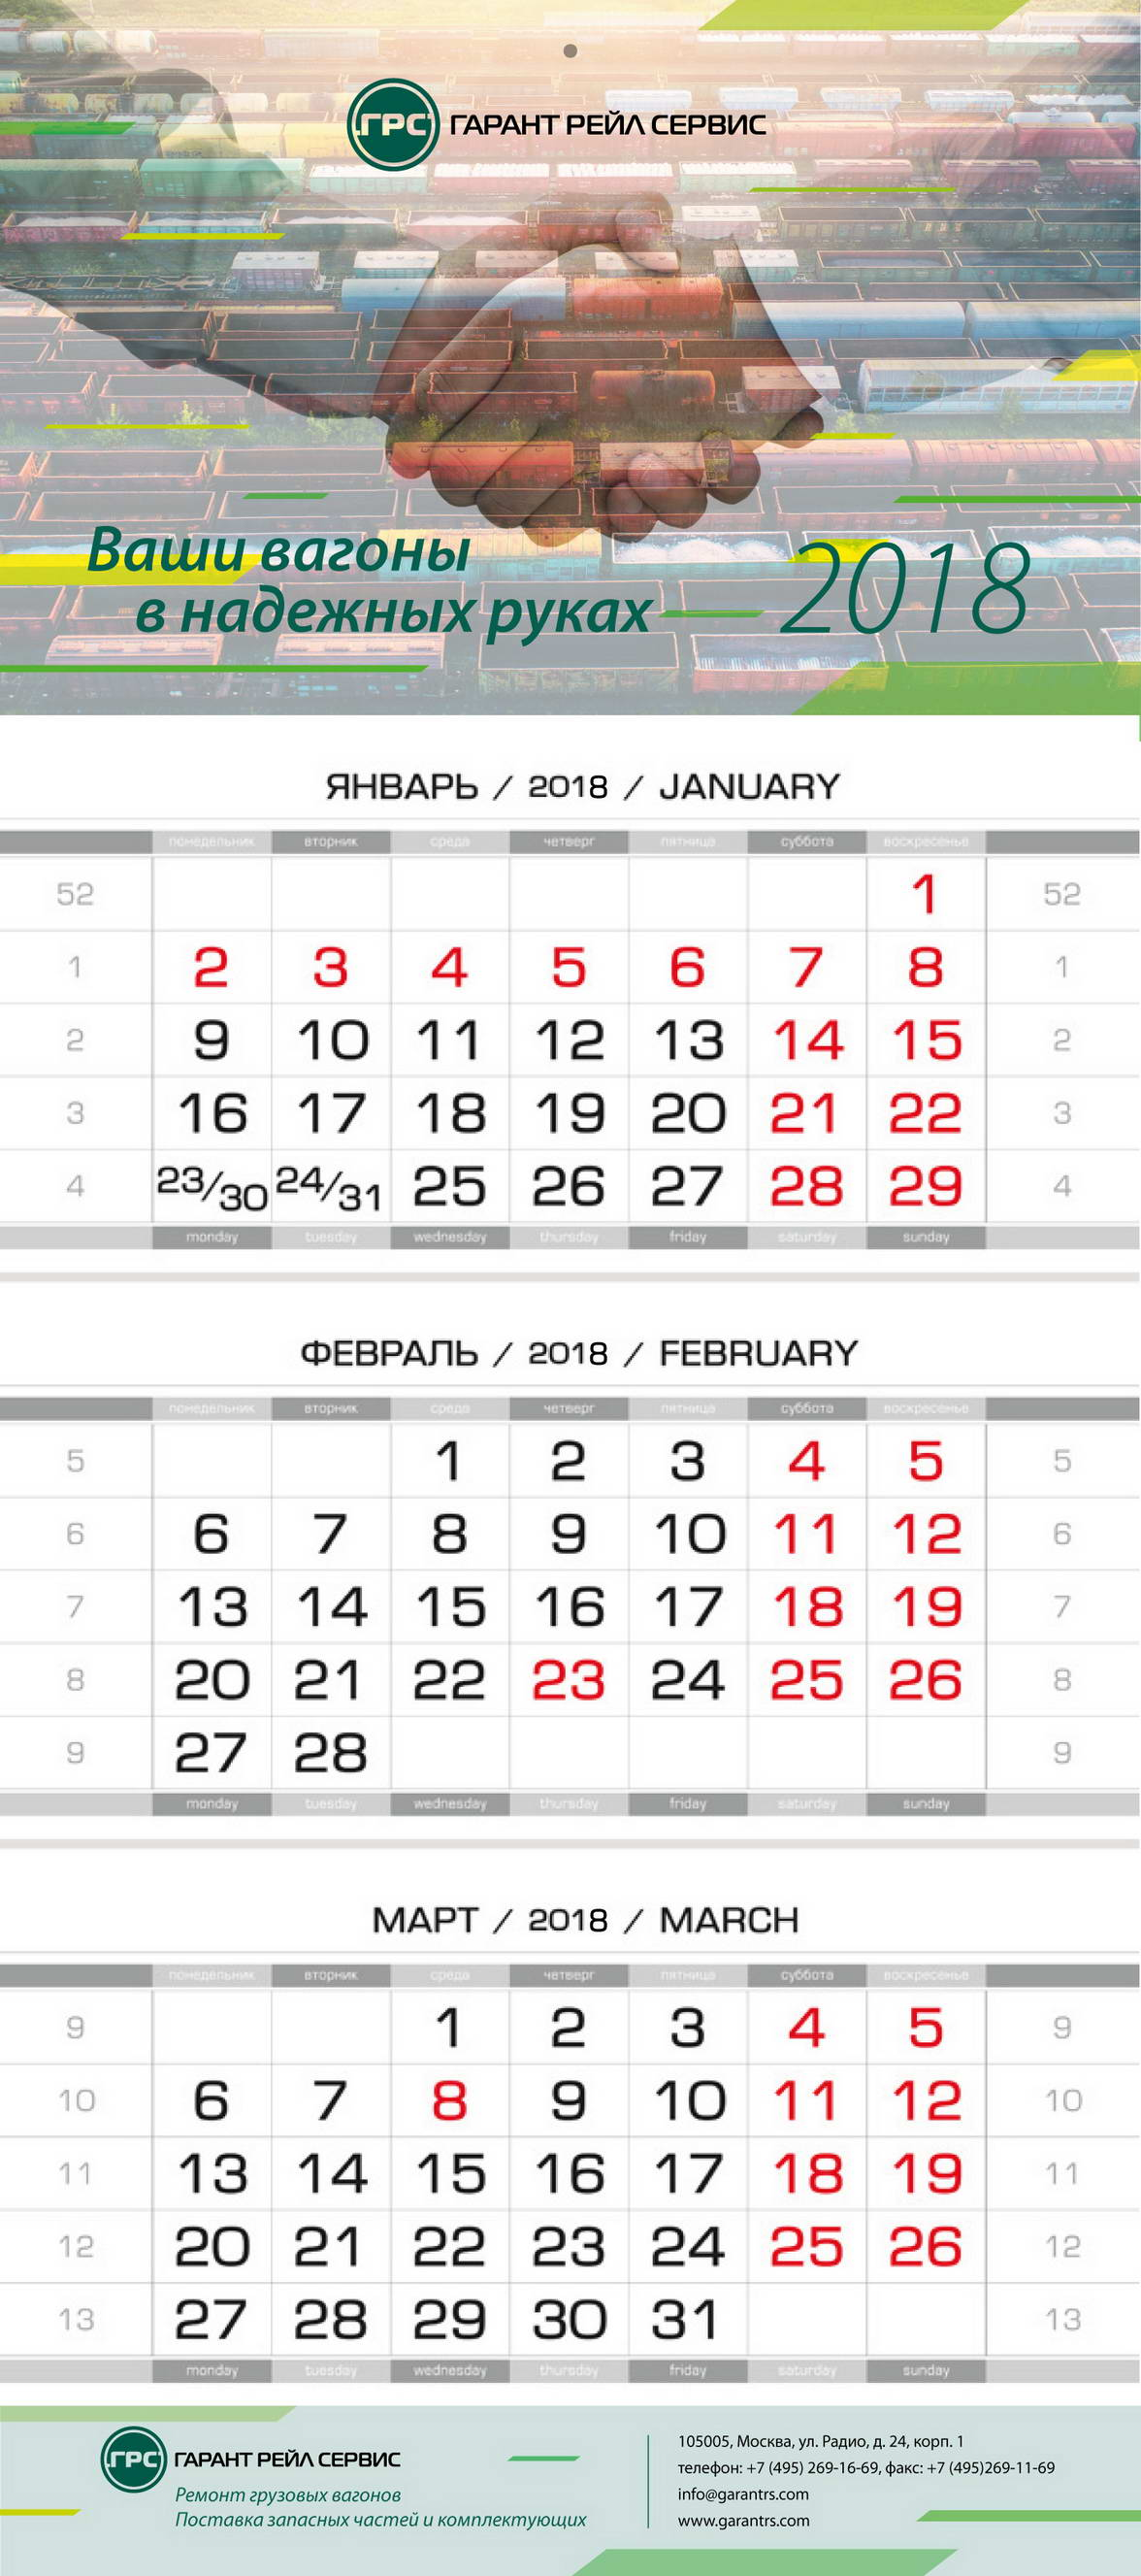 Dizajn korporativni kalendar 2018